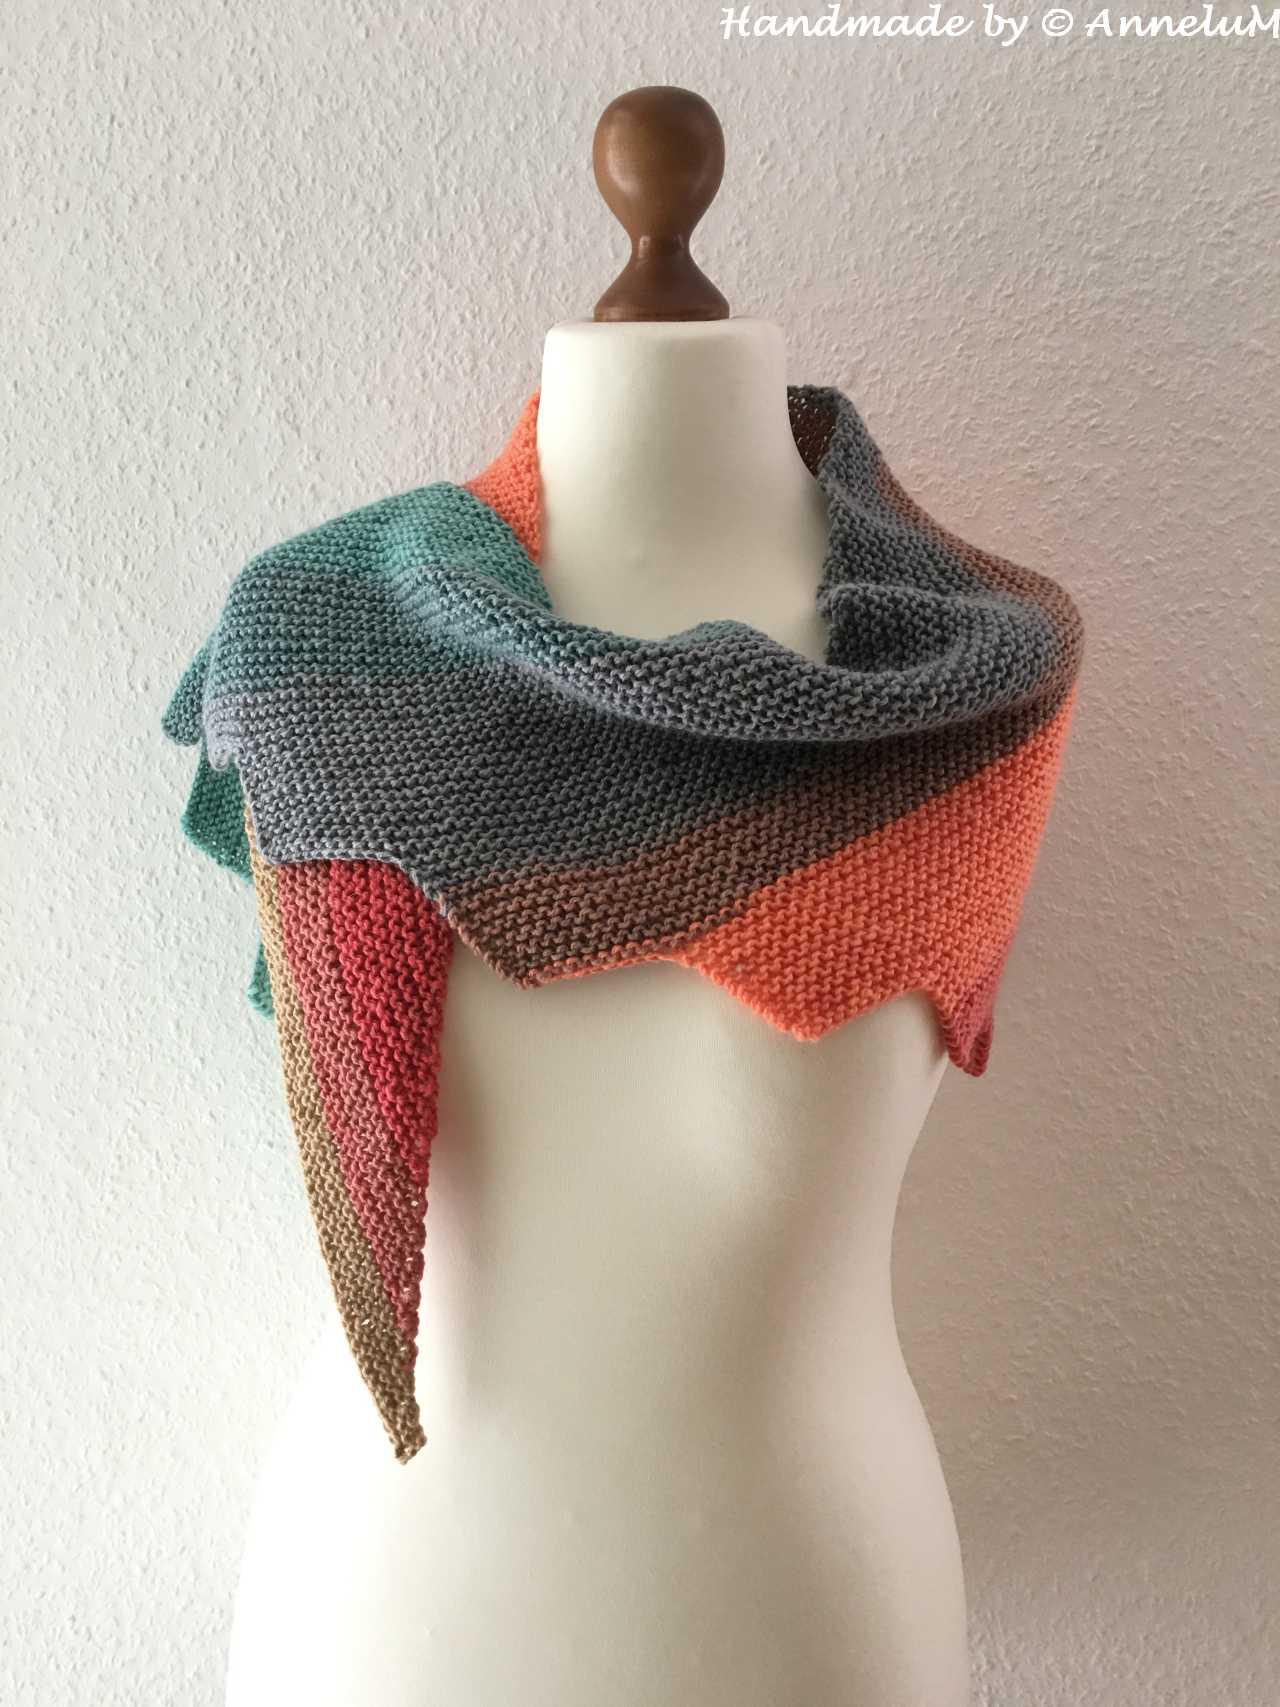 Triangle Shawl Handmade by AnneluM